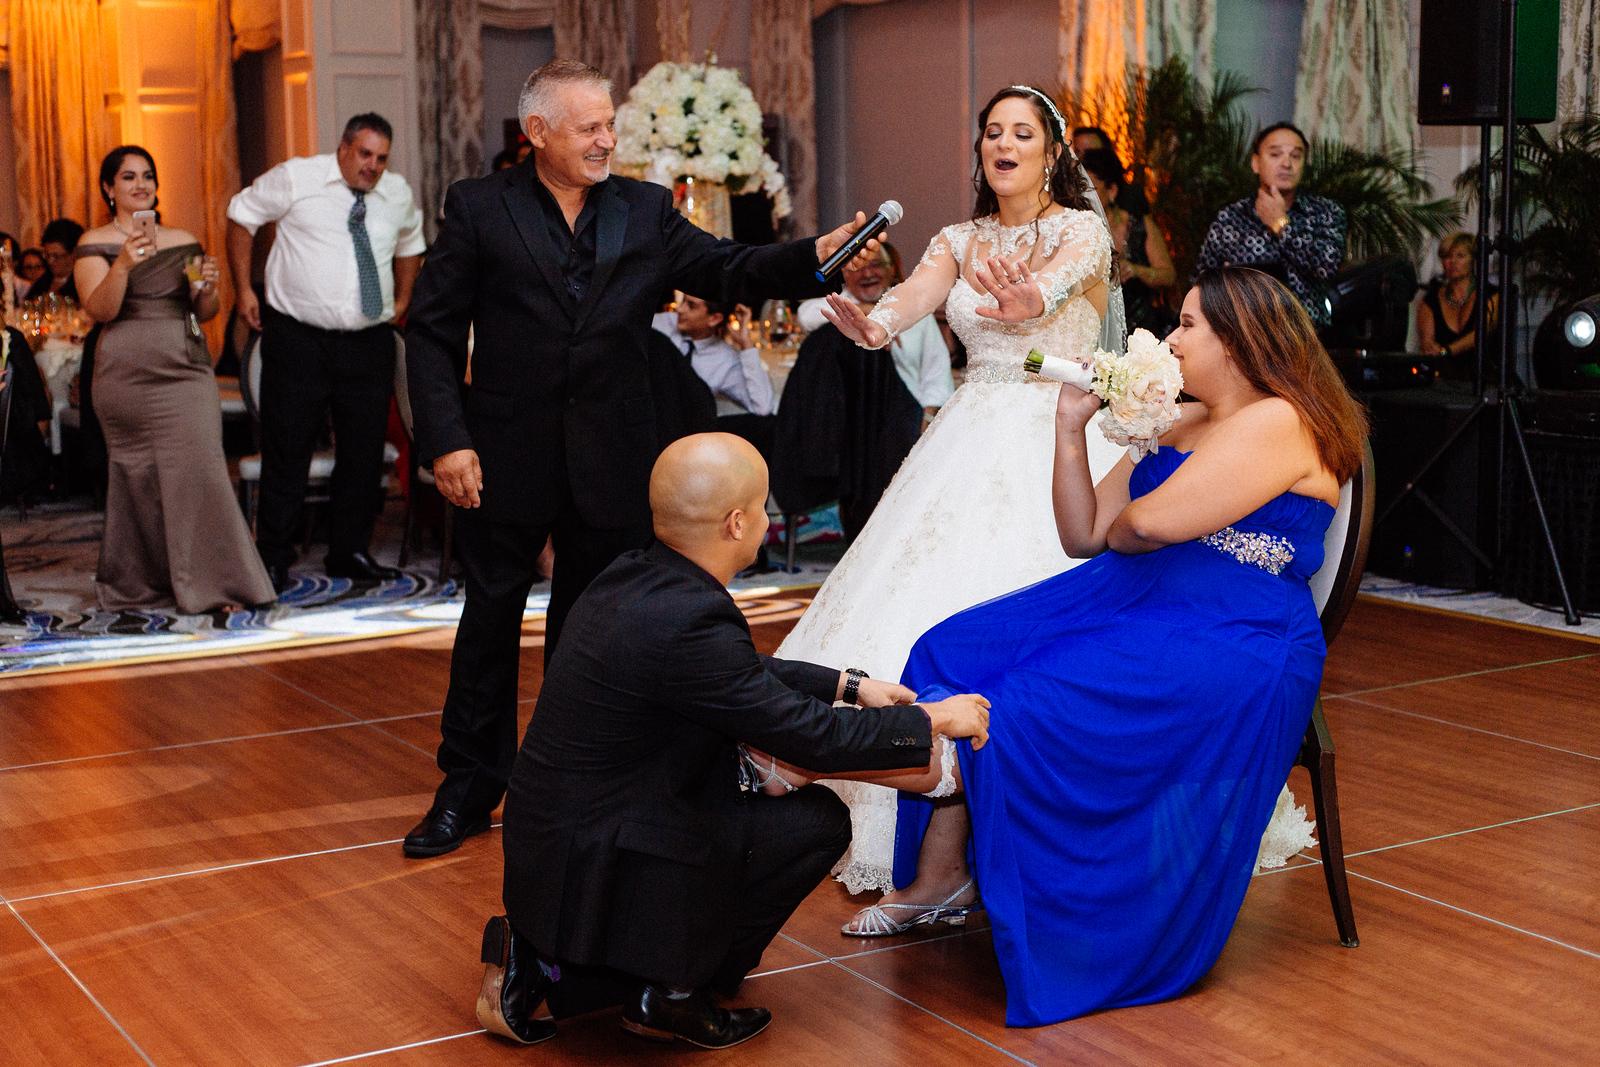 South-Florida-Wedding-Photographer-Andreo-5D3_5448